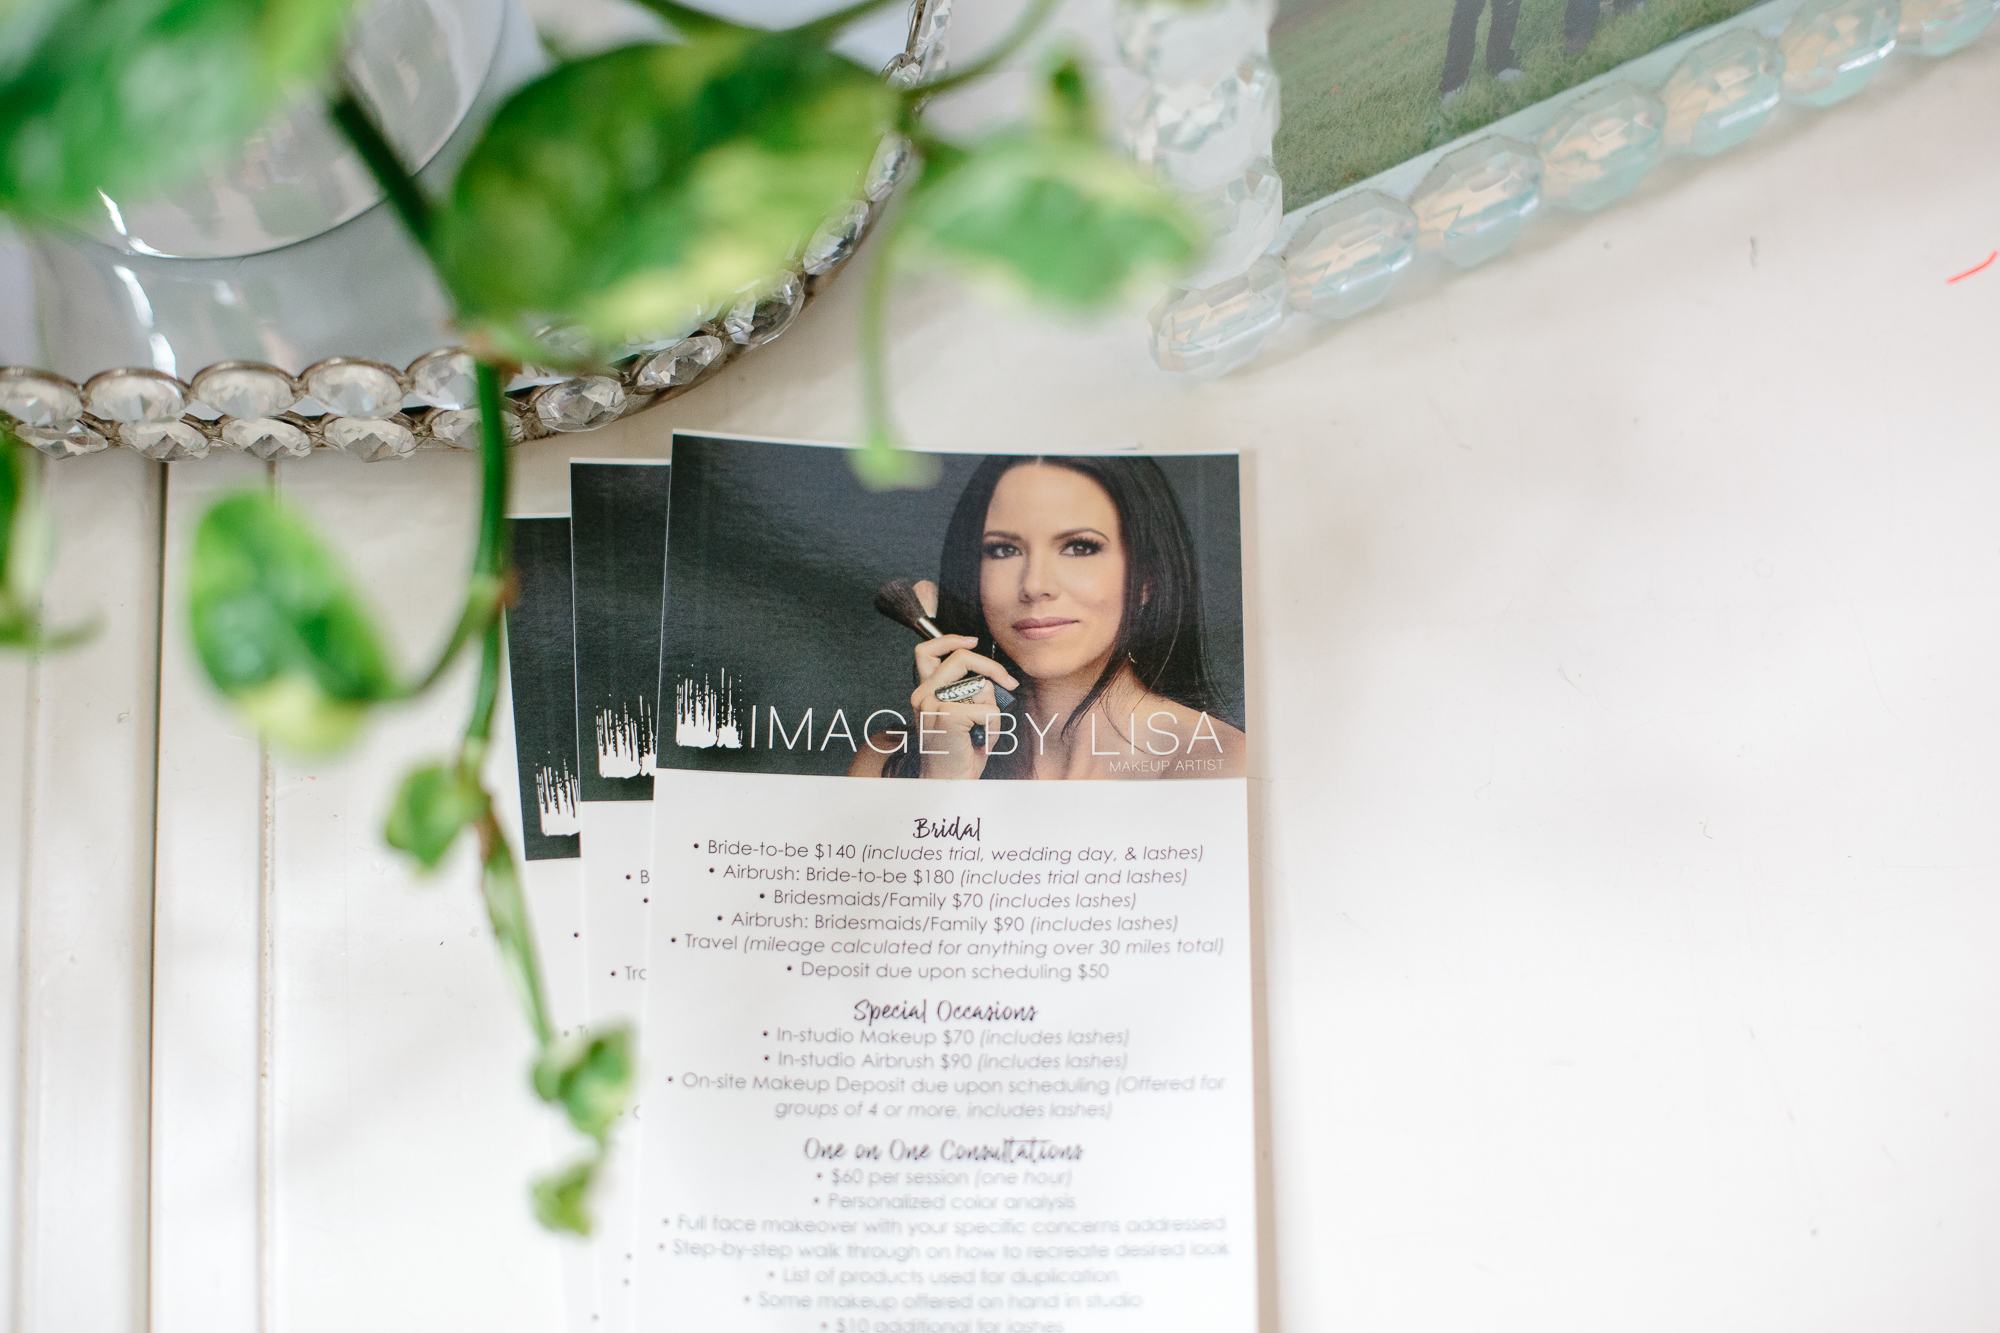 Sarah Gray Photography Website Launch, Tallahassee, Florida maternity, newborn, family photographer